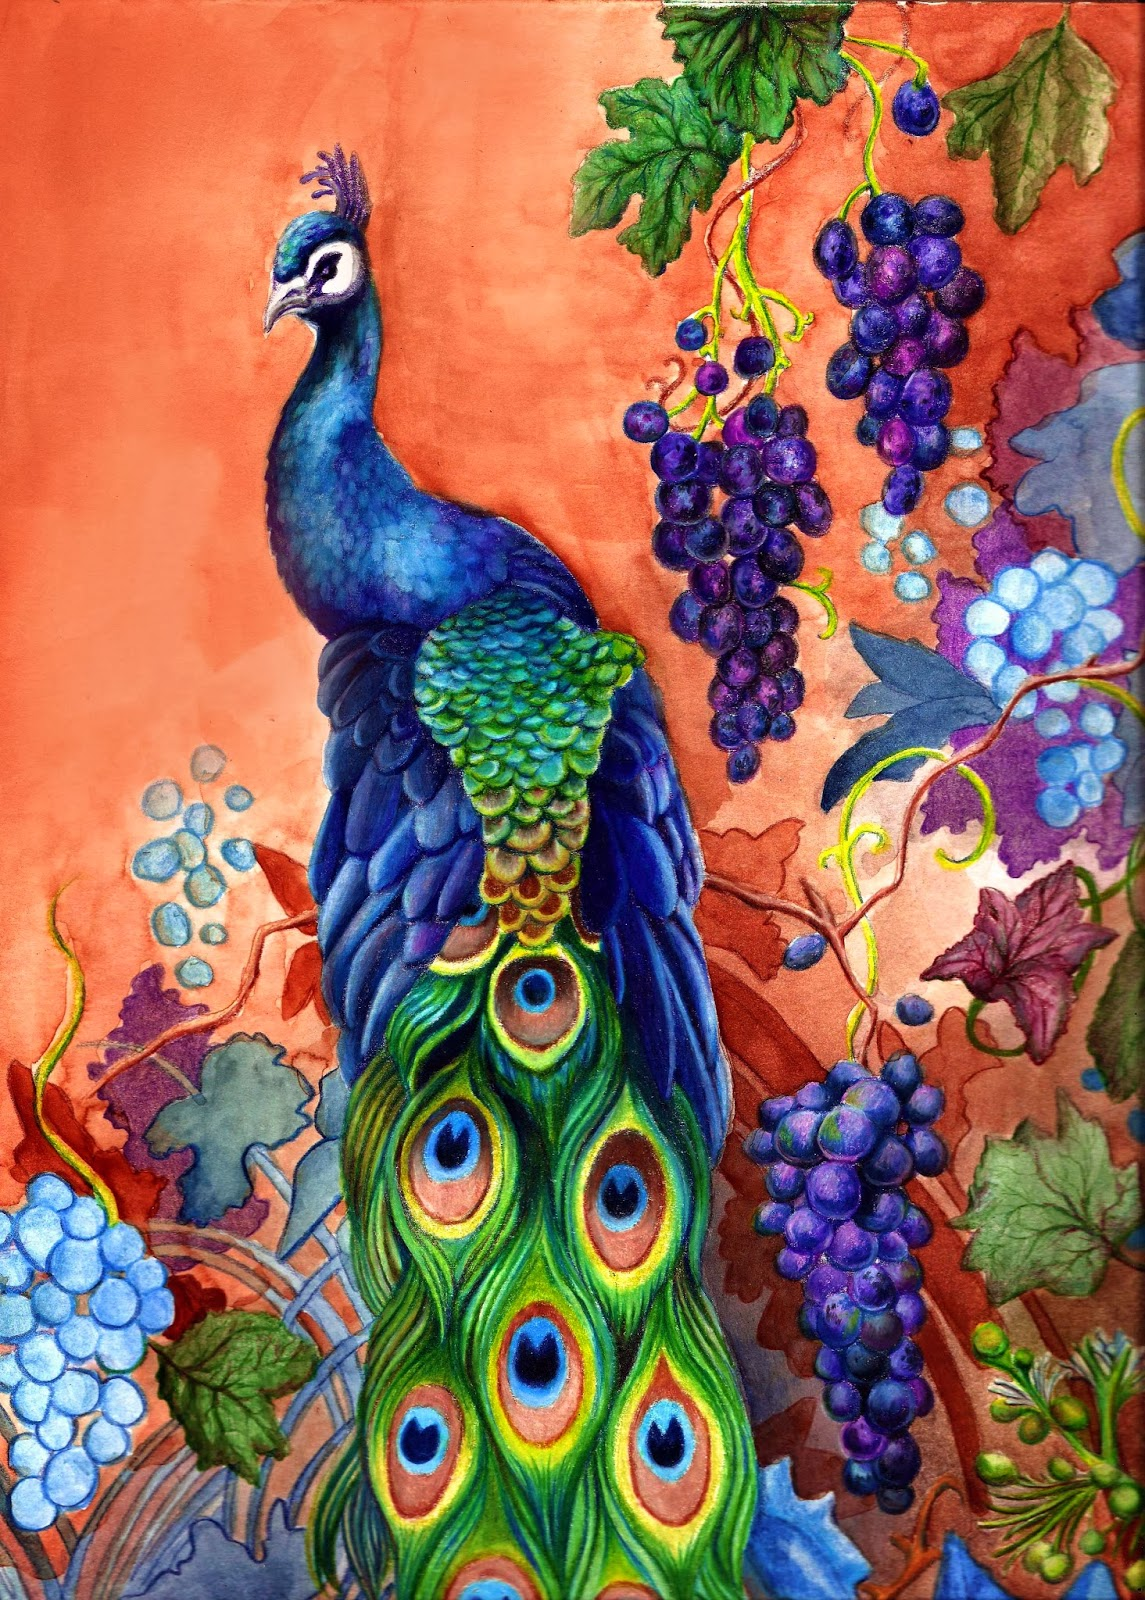 peacock bird artwork with grapes